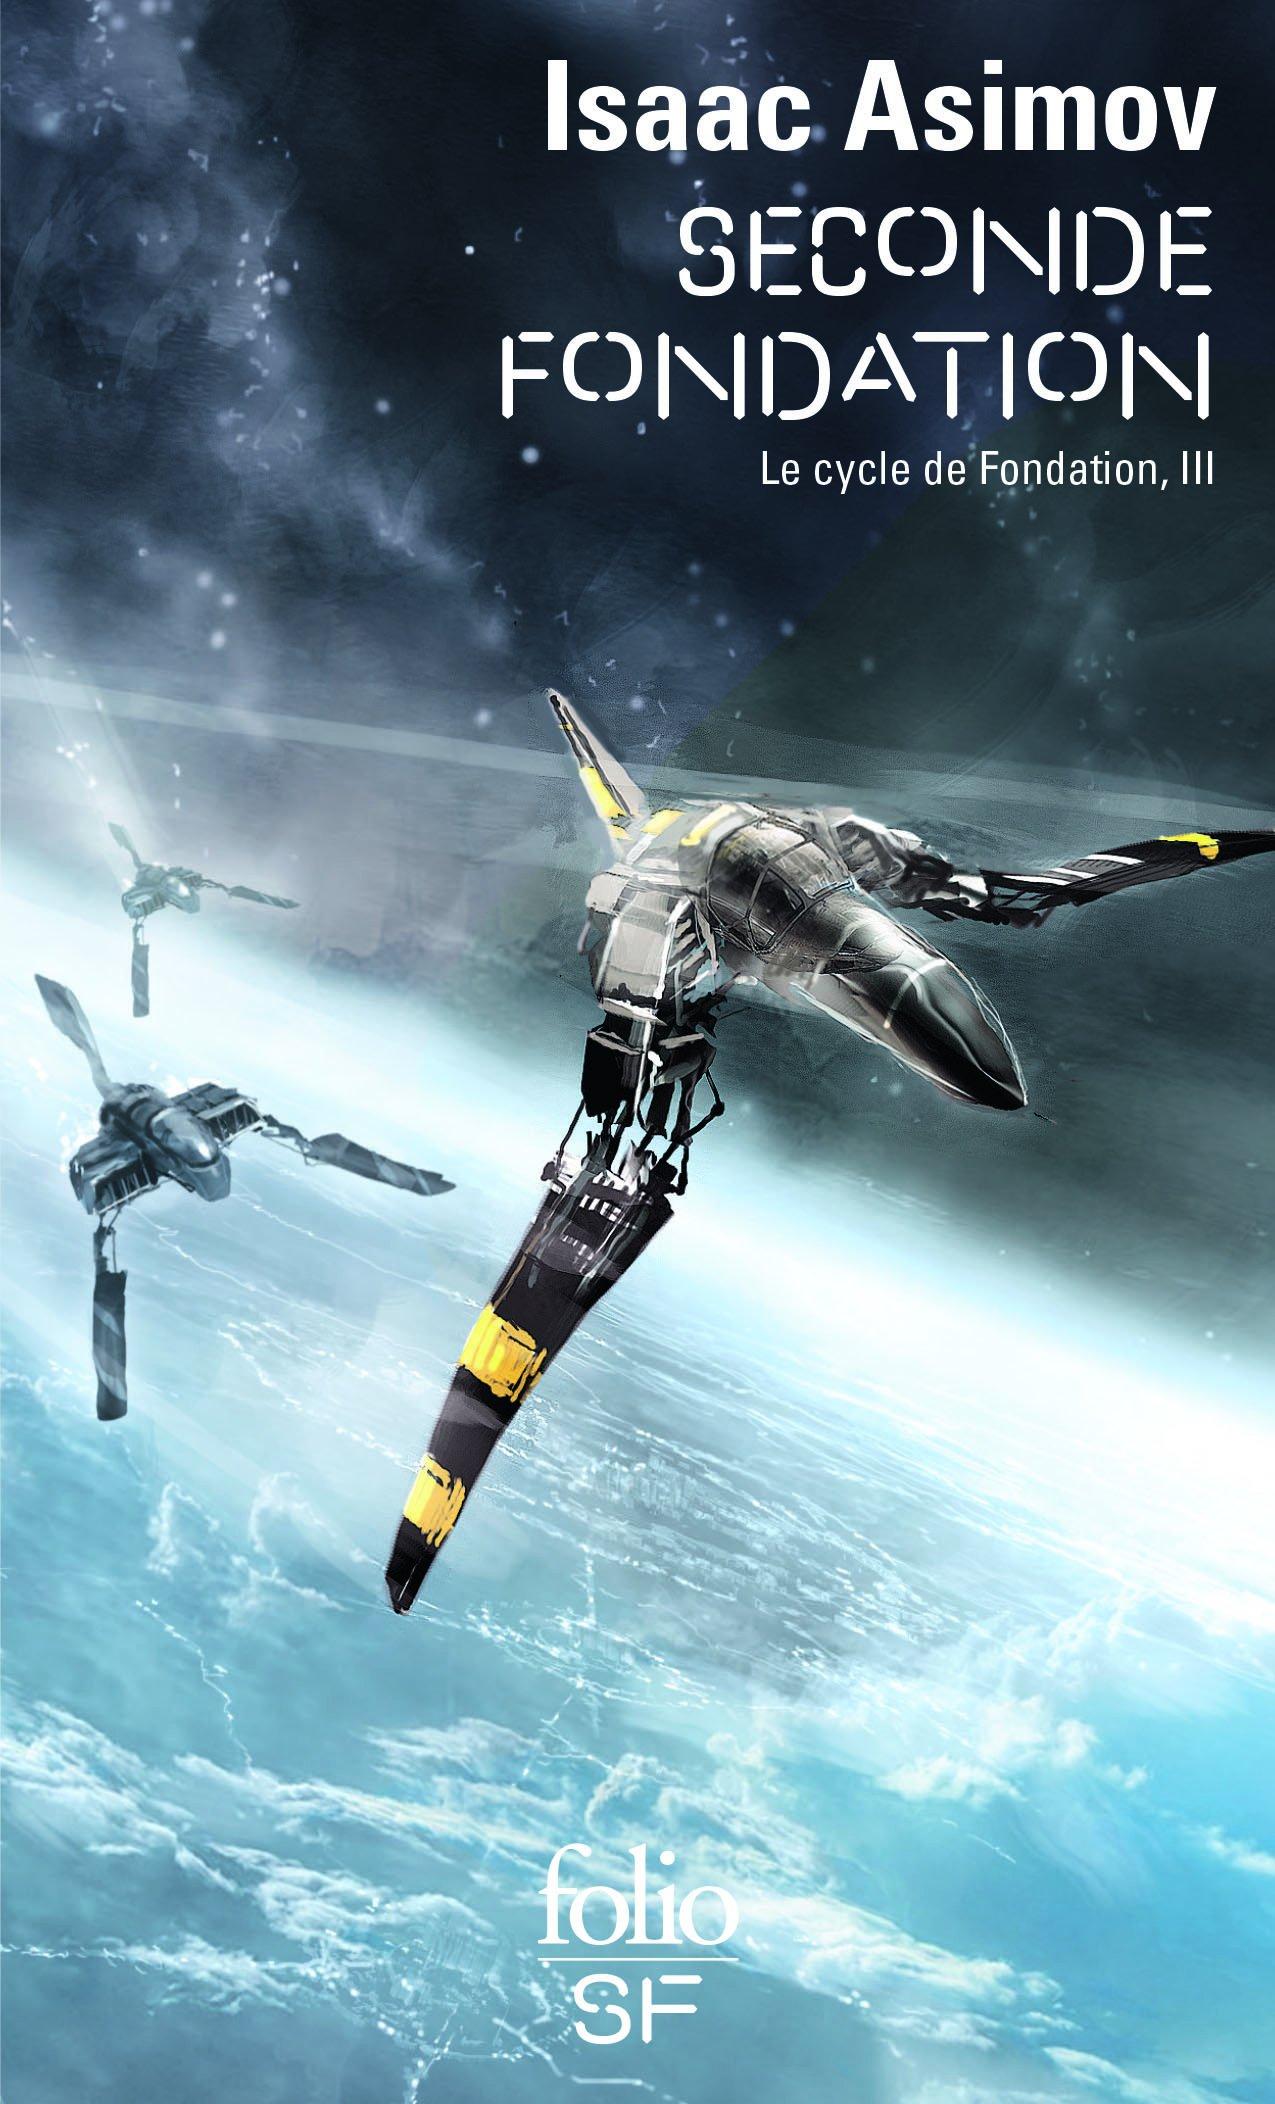 Le cycle de Fondation, III:Seconde Fondation (Anglais) Poche – 26 mars 2009 Isaac Asimov Pierre Billon Folio 2070360520